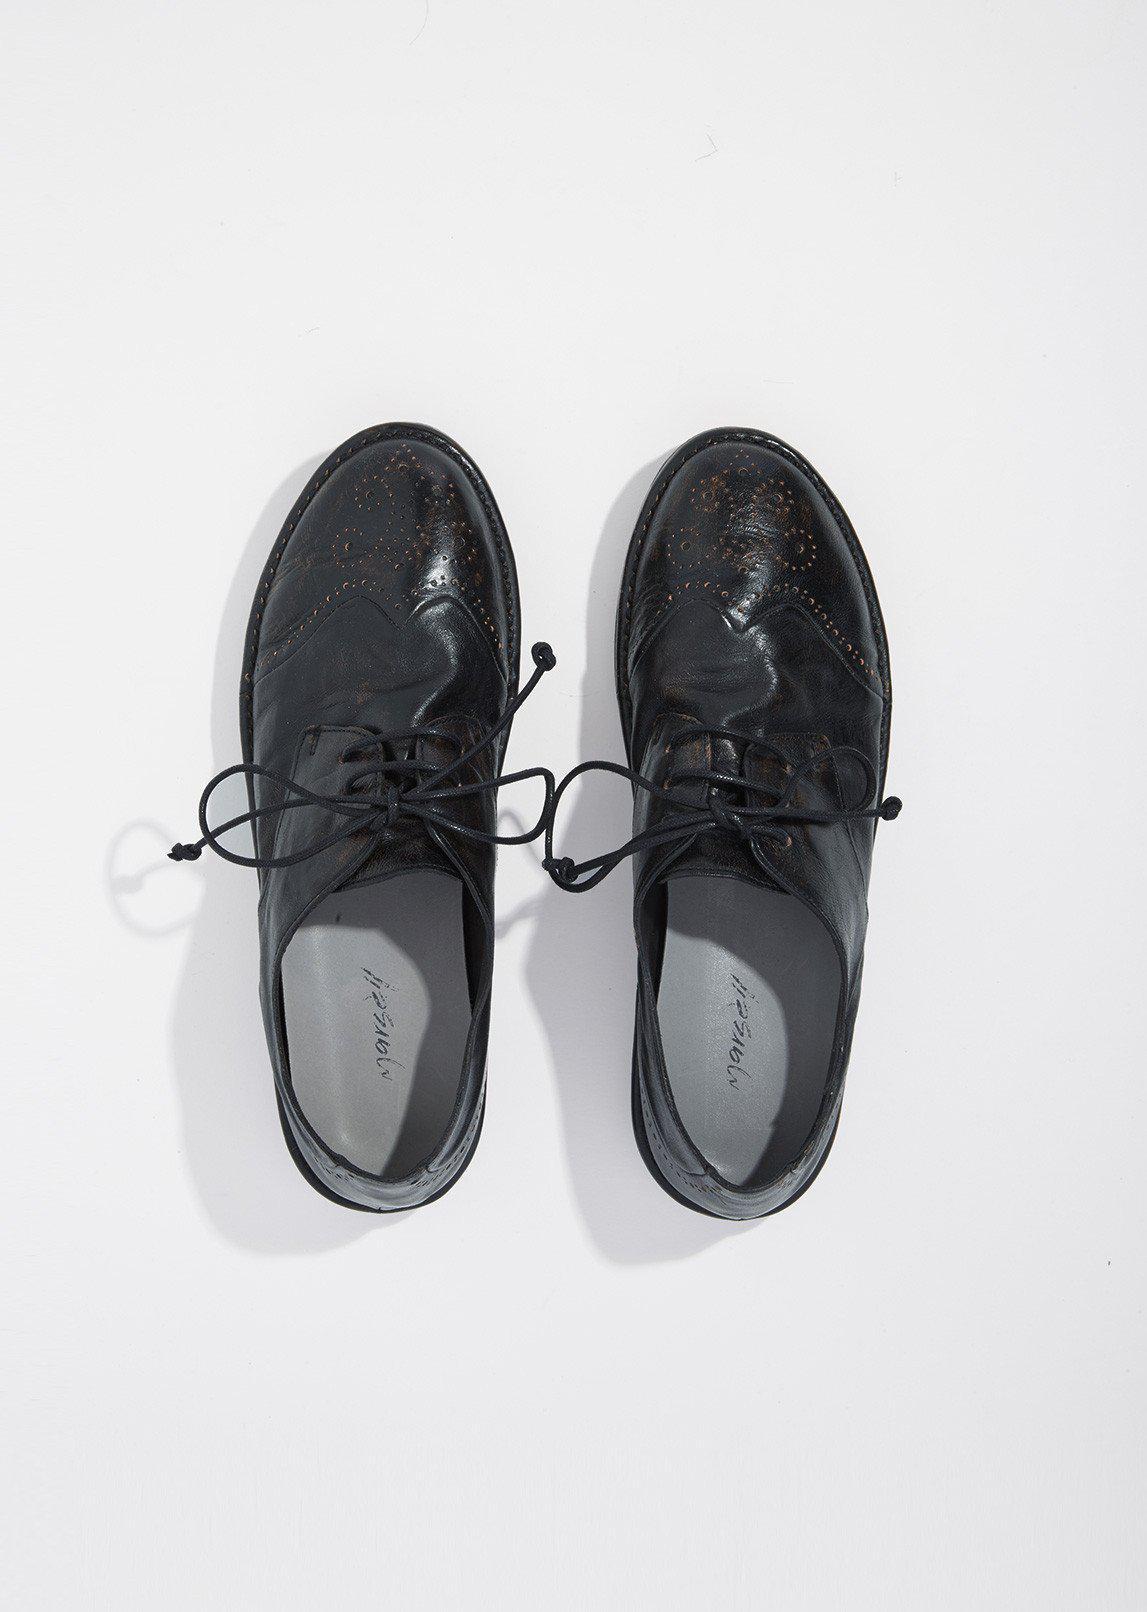 Marsèll MWG002 NERO Women/'s fashion round toe lace-ups shoes black calf leather